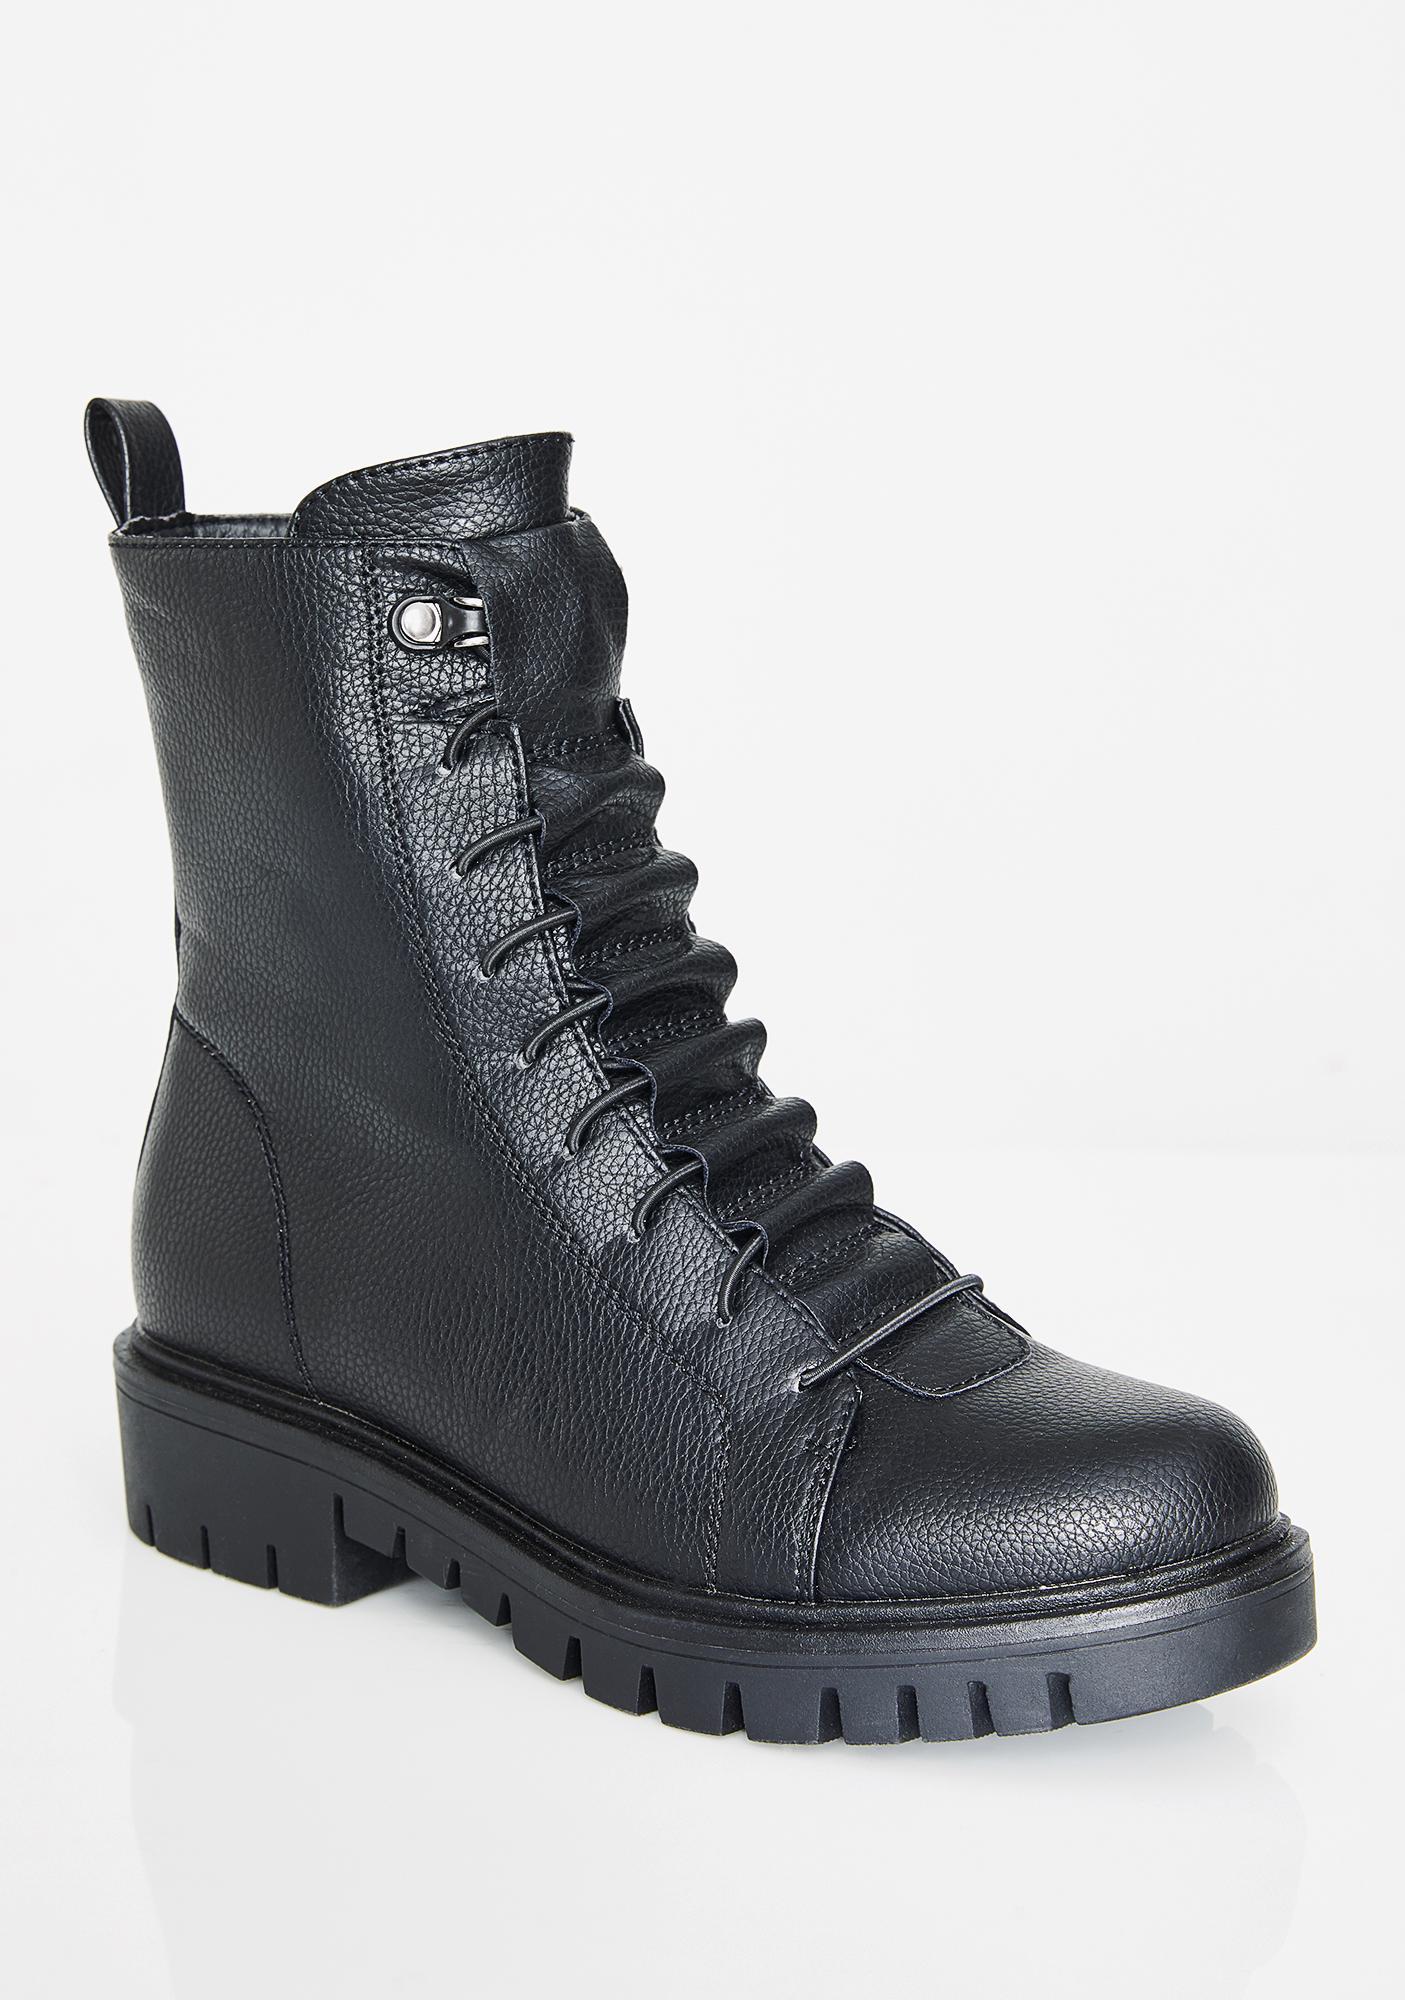 Gotham Sirens Combat Boots